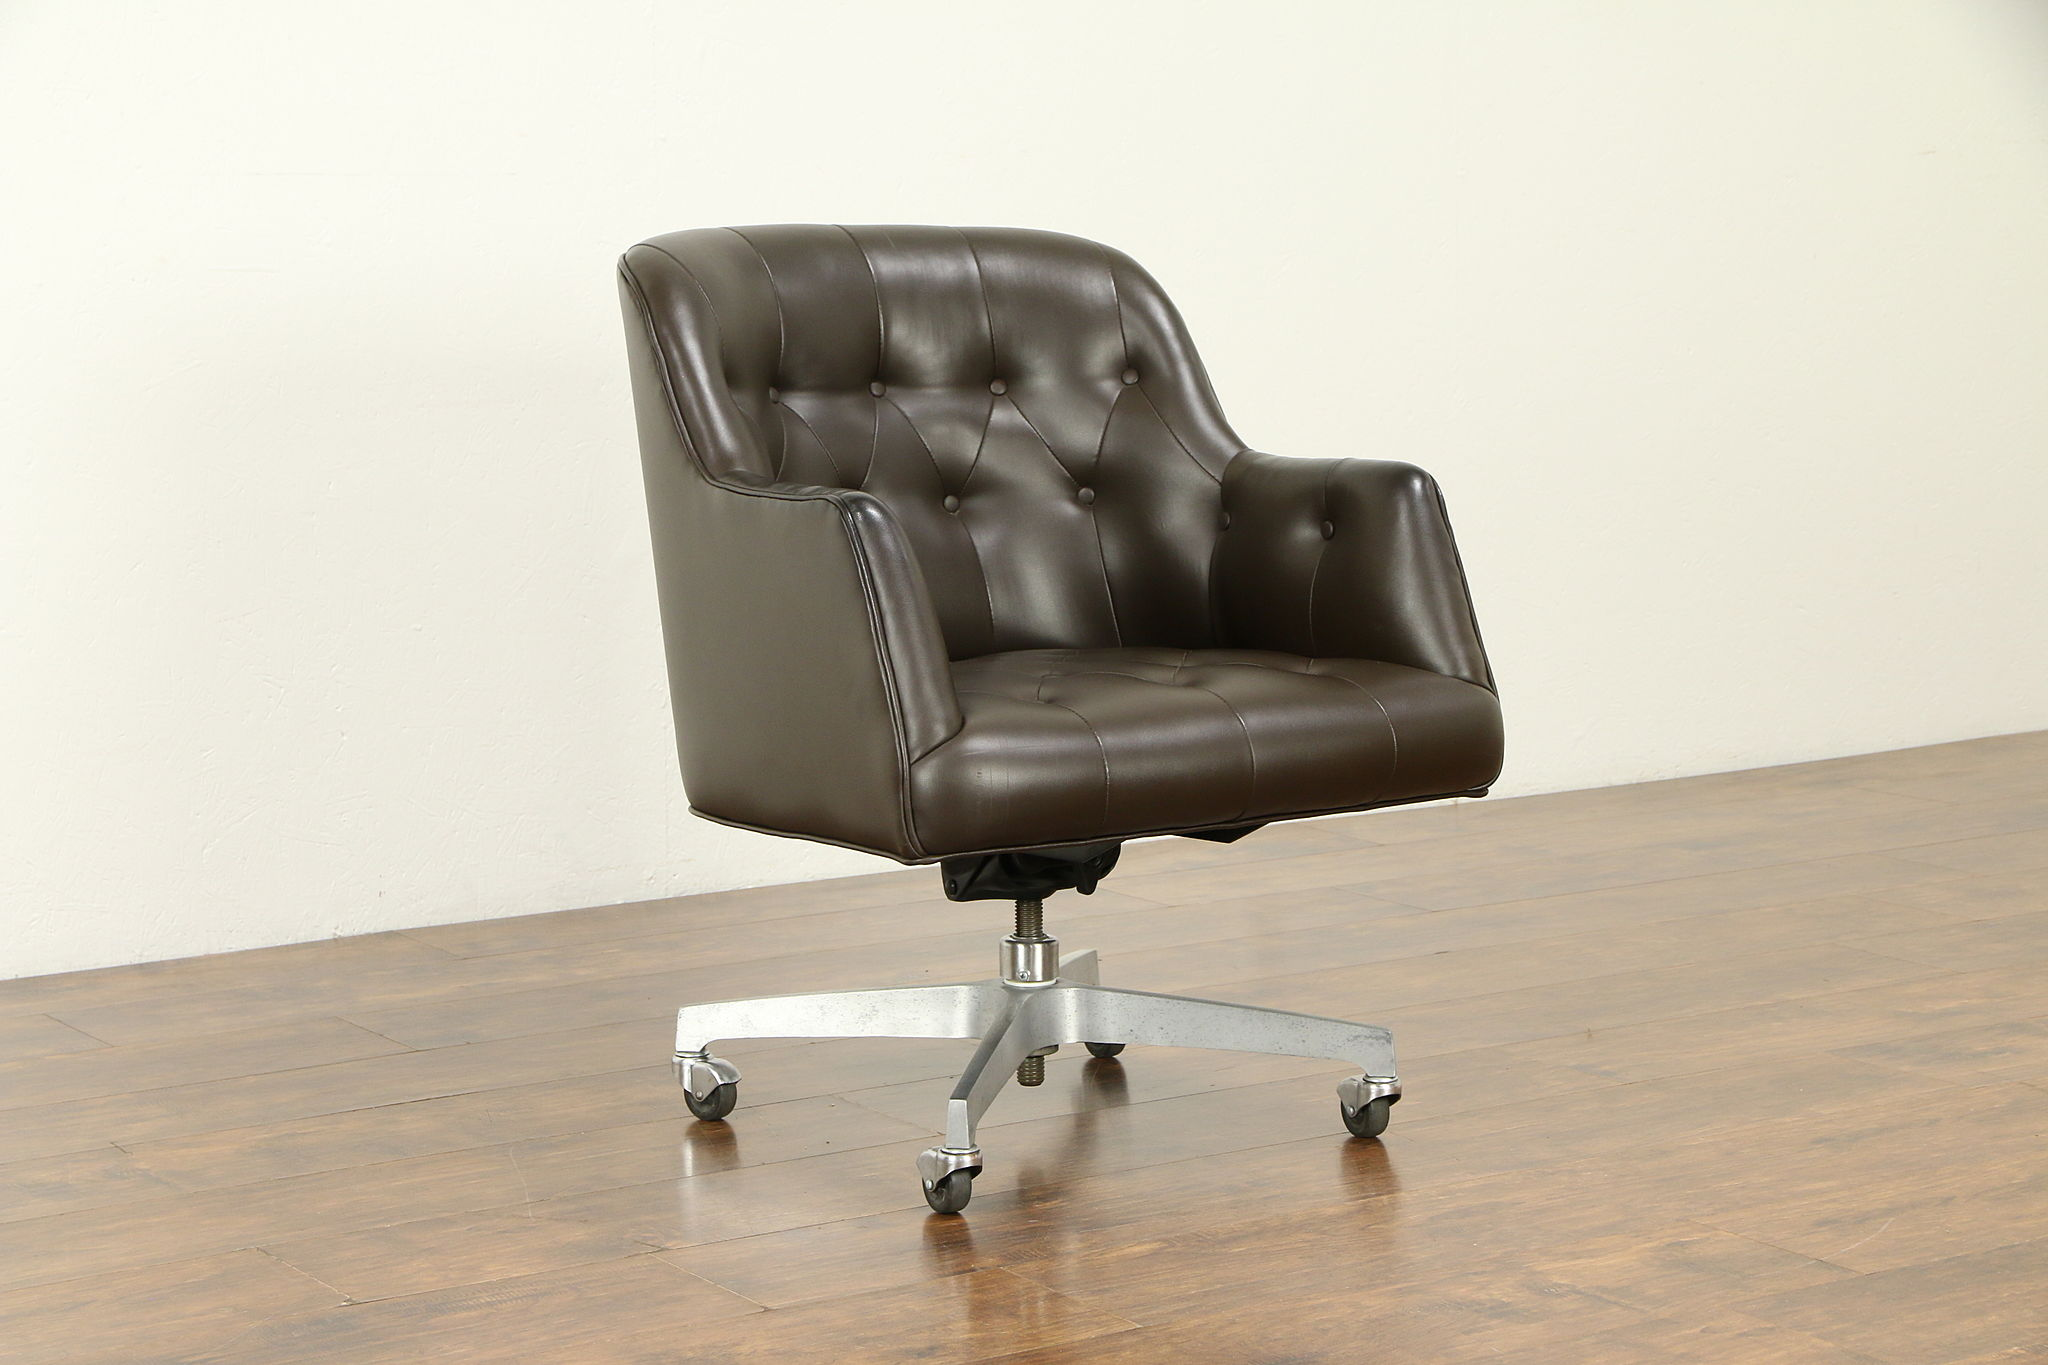 Magnificent Midcentury Modern Vintage Leather Swivel Adjustable Desk Chair Marble 32150 Unemploymentrelief Wooden Chair Designs For Living Room Unemploymentrelieforg